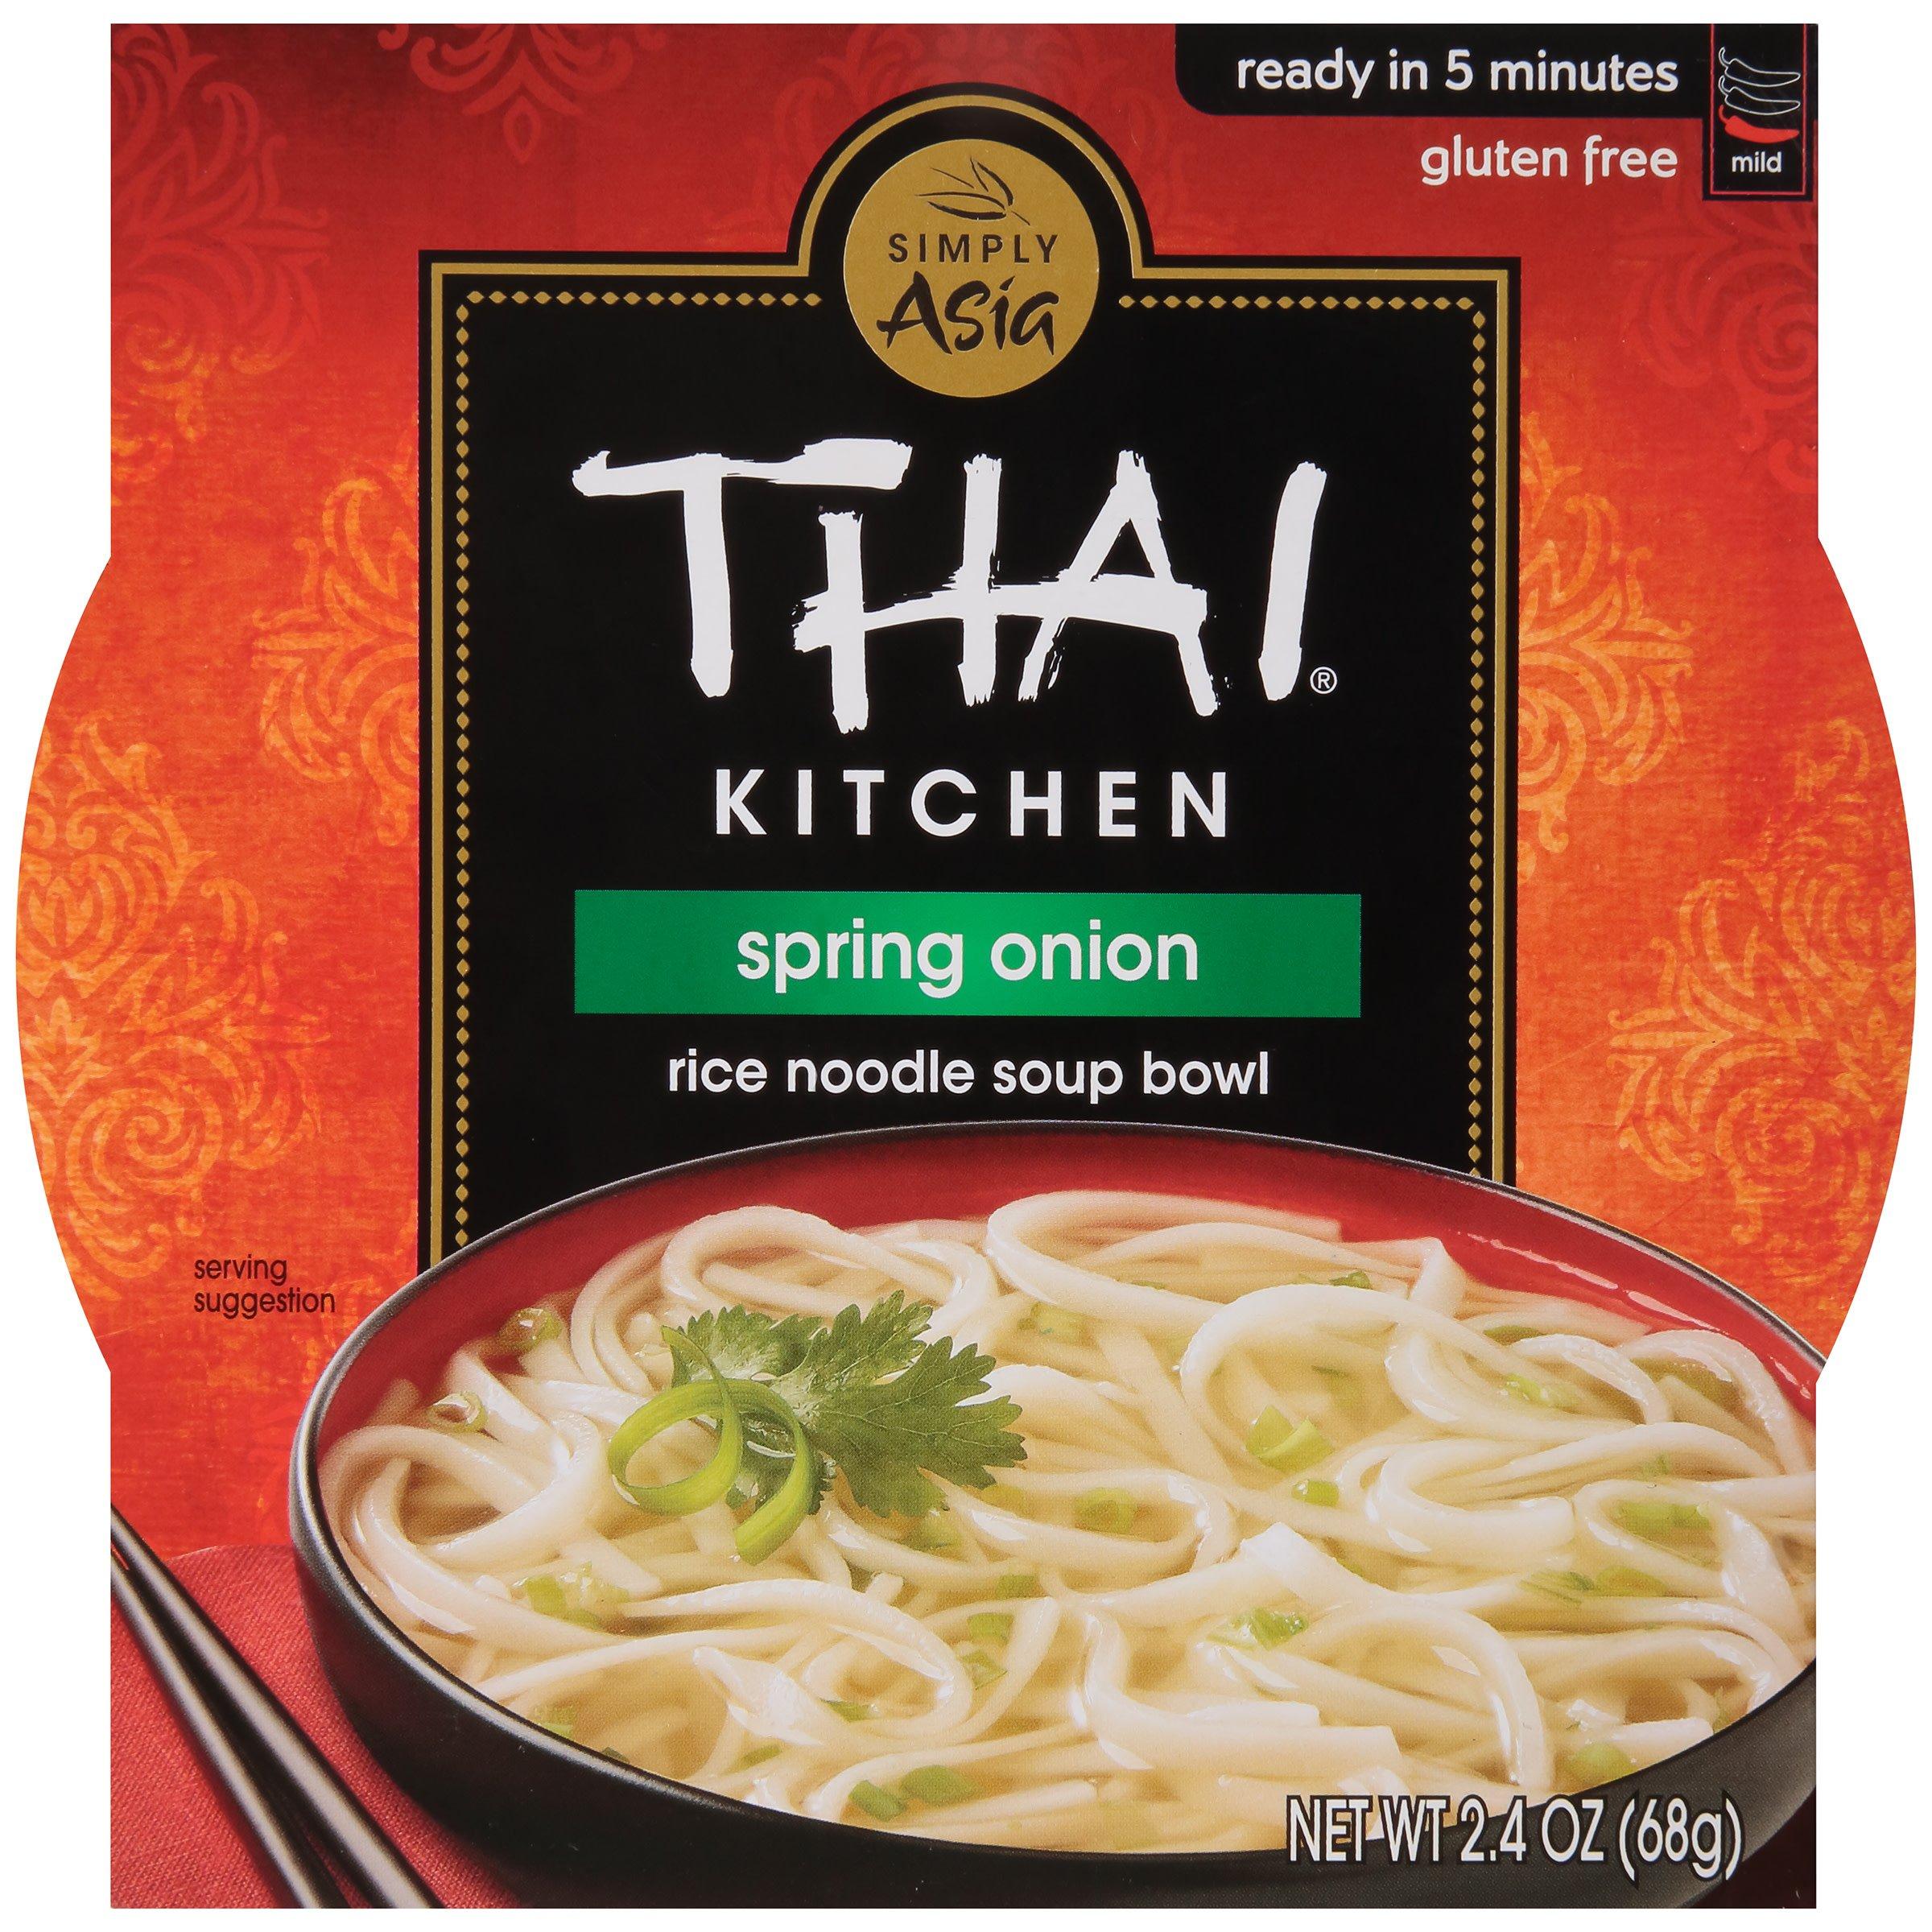 Thai Kitchen Spring Onion Rice Noodle Bowl Shop Soups Chili At H E B